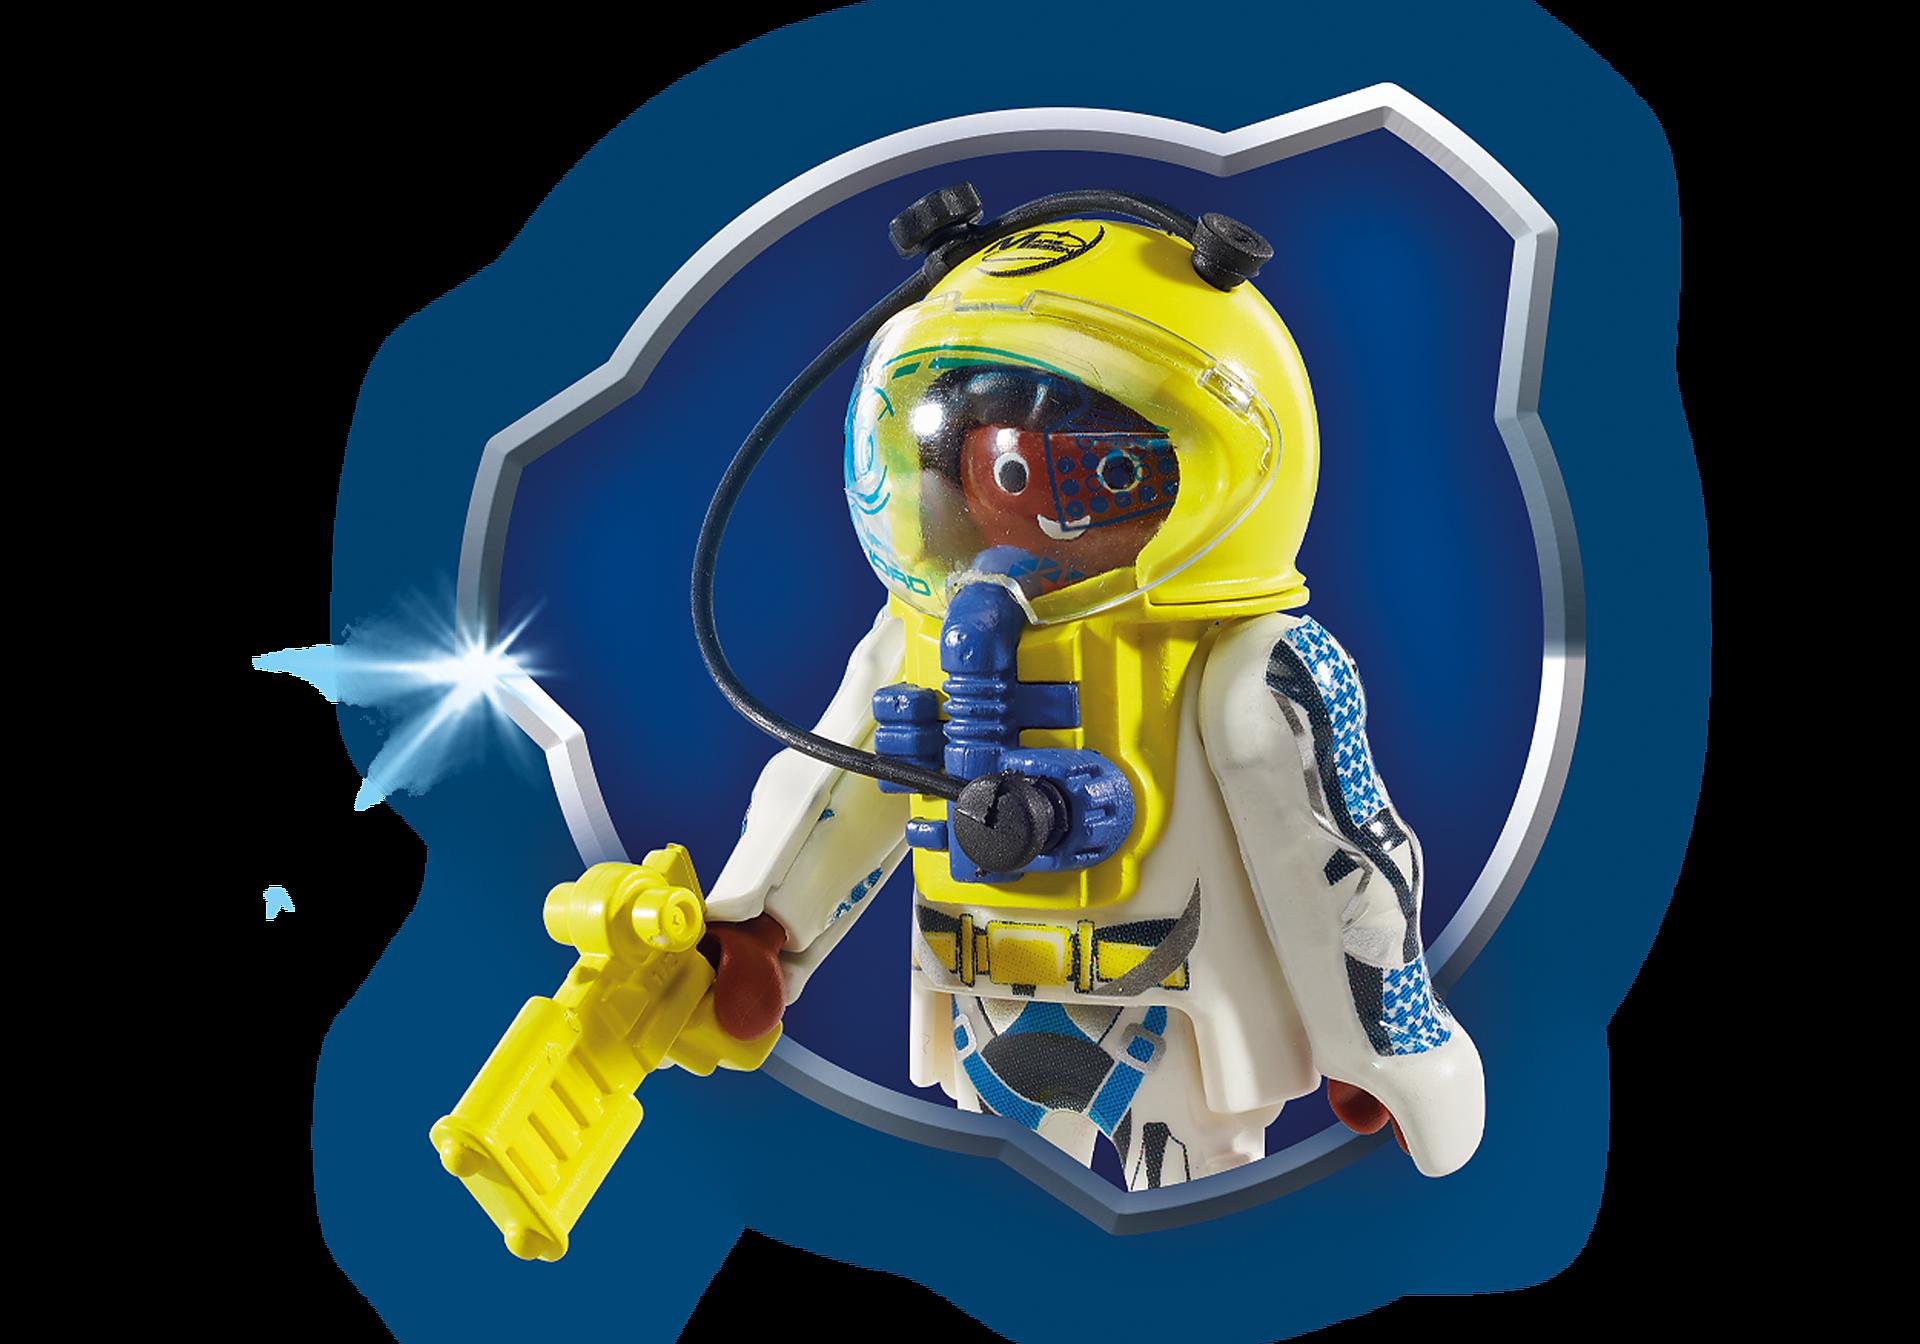 http://media.playmobil.com/i/playmobil/9491_product_extra2/Spationaute avec véhicule d'exploration spatiale